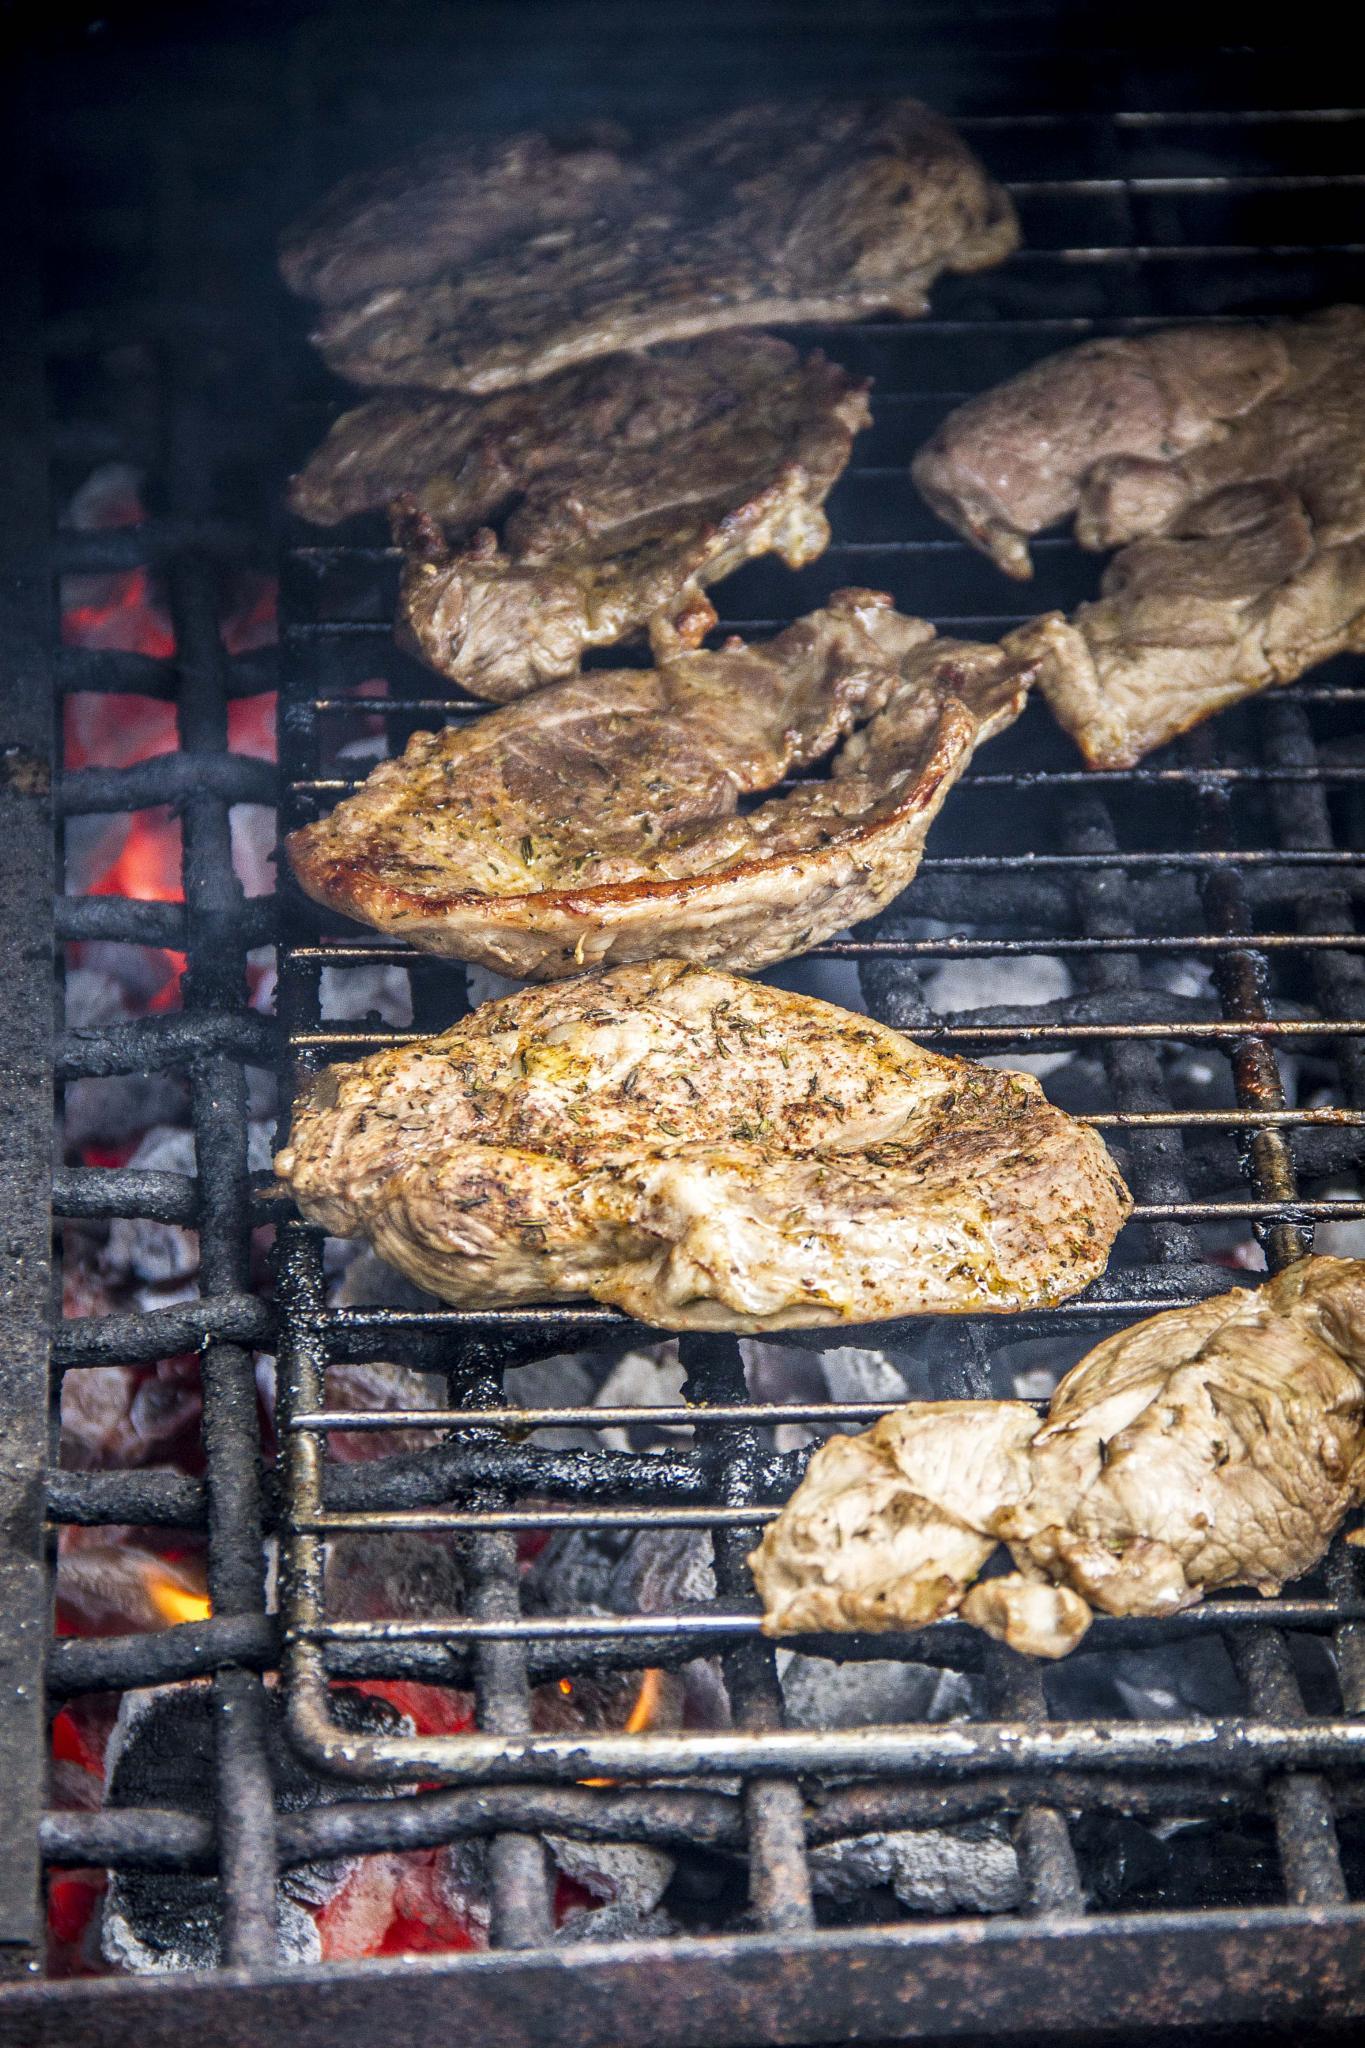 BBQ Day by Julien Meneret